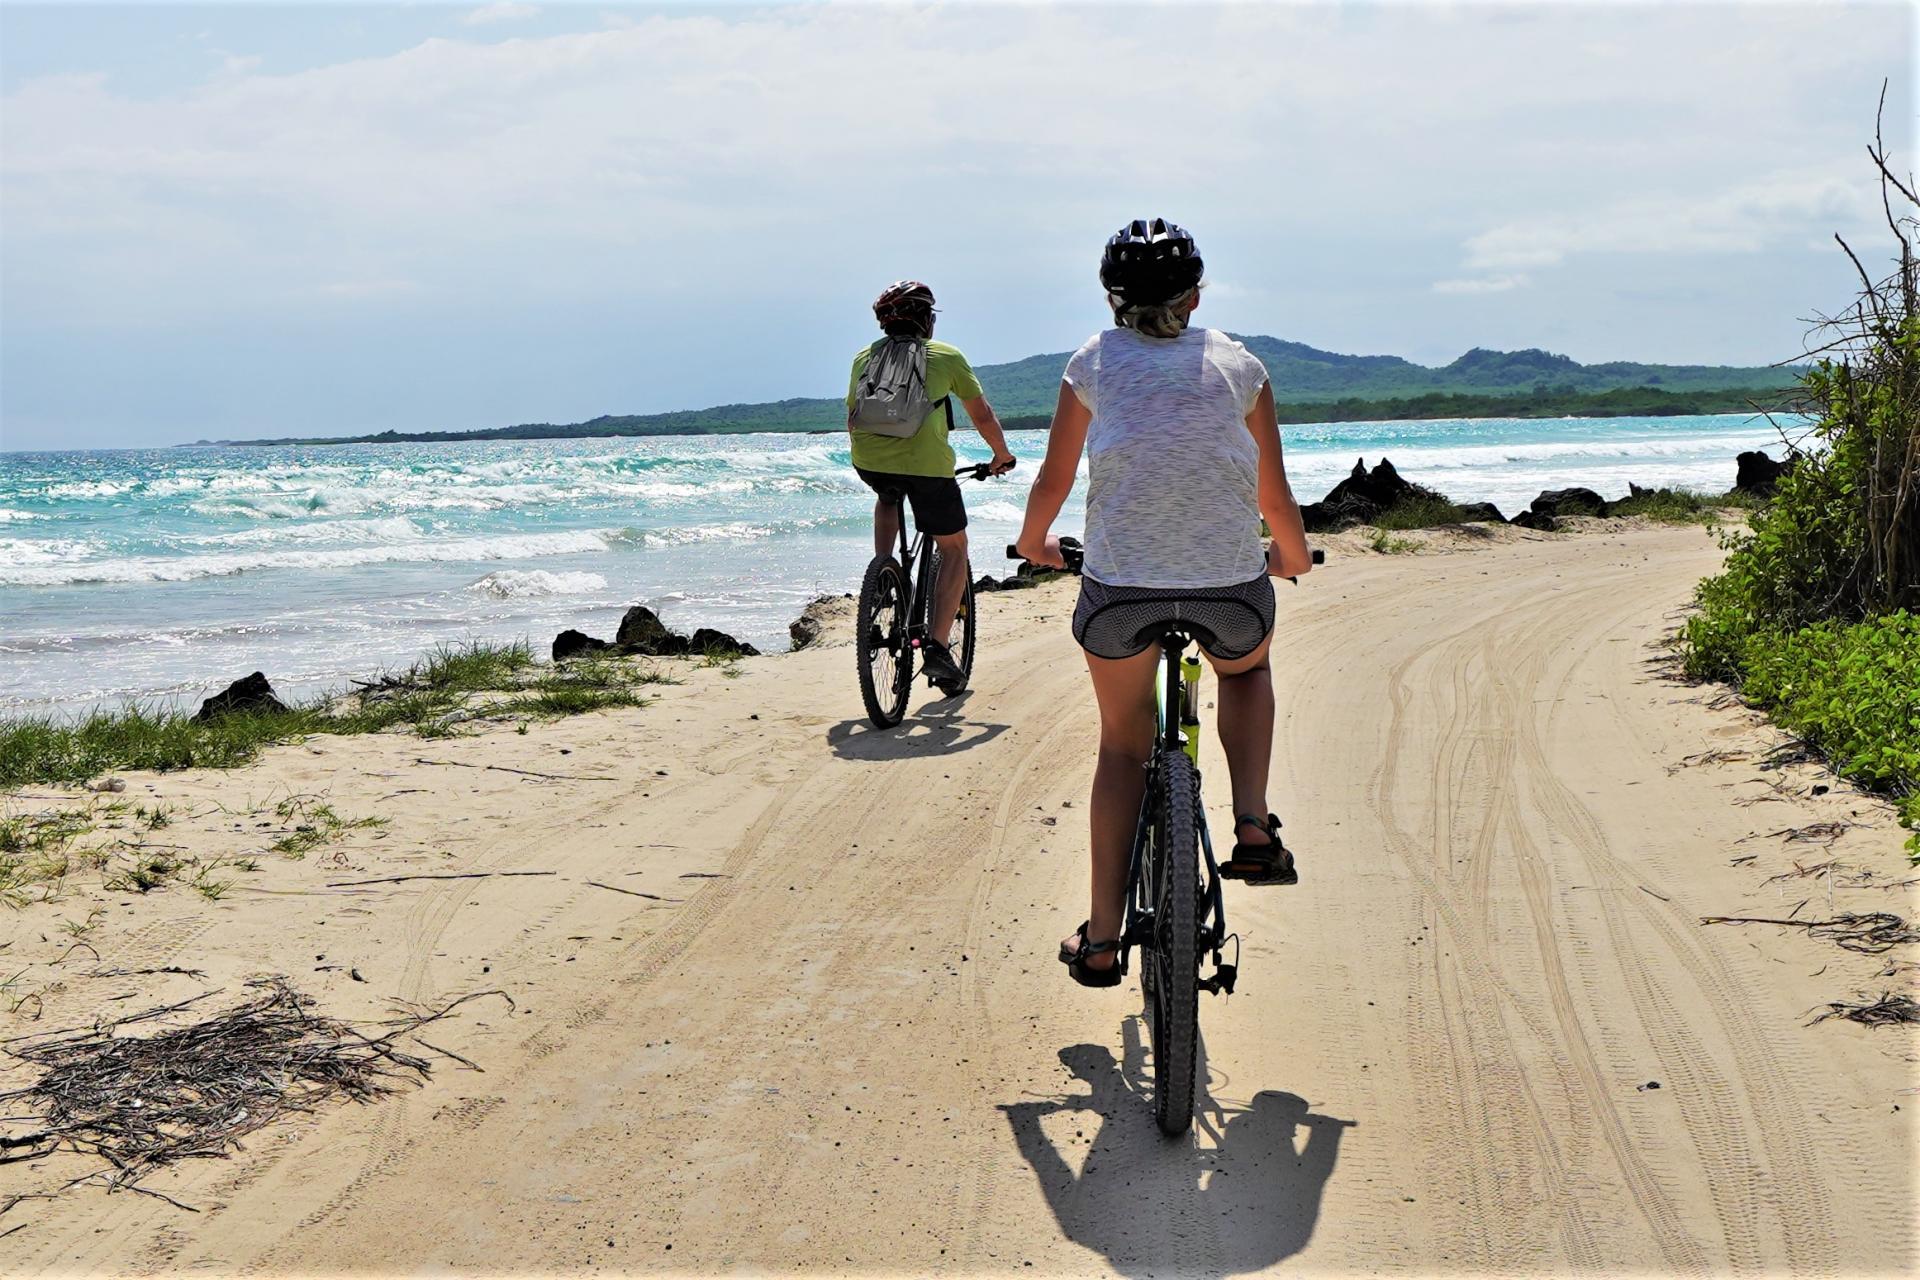 Shoreline biking in the Galapagos